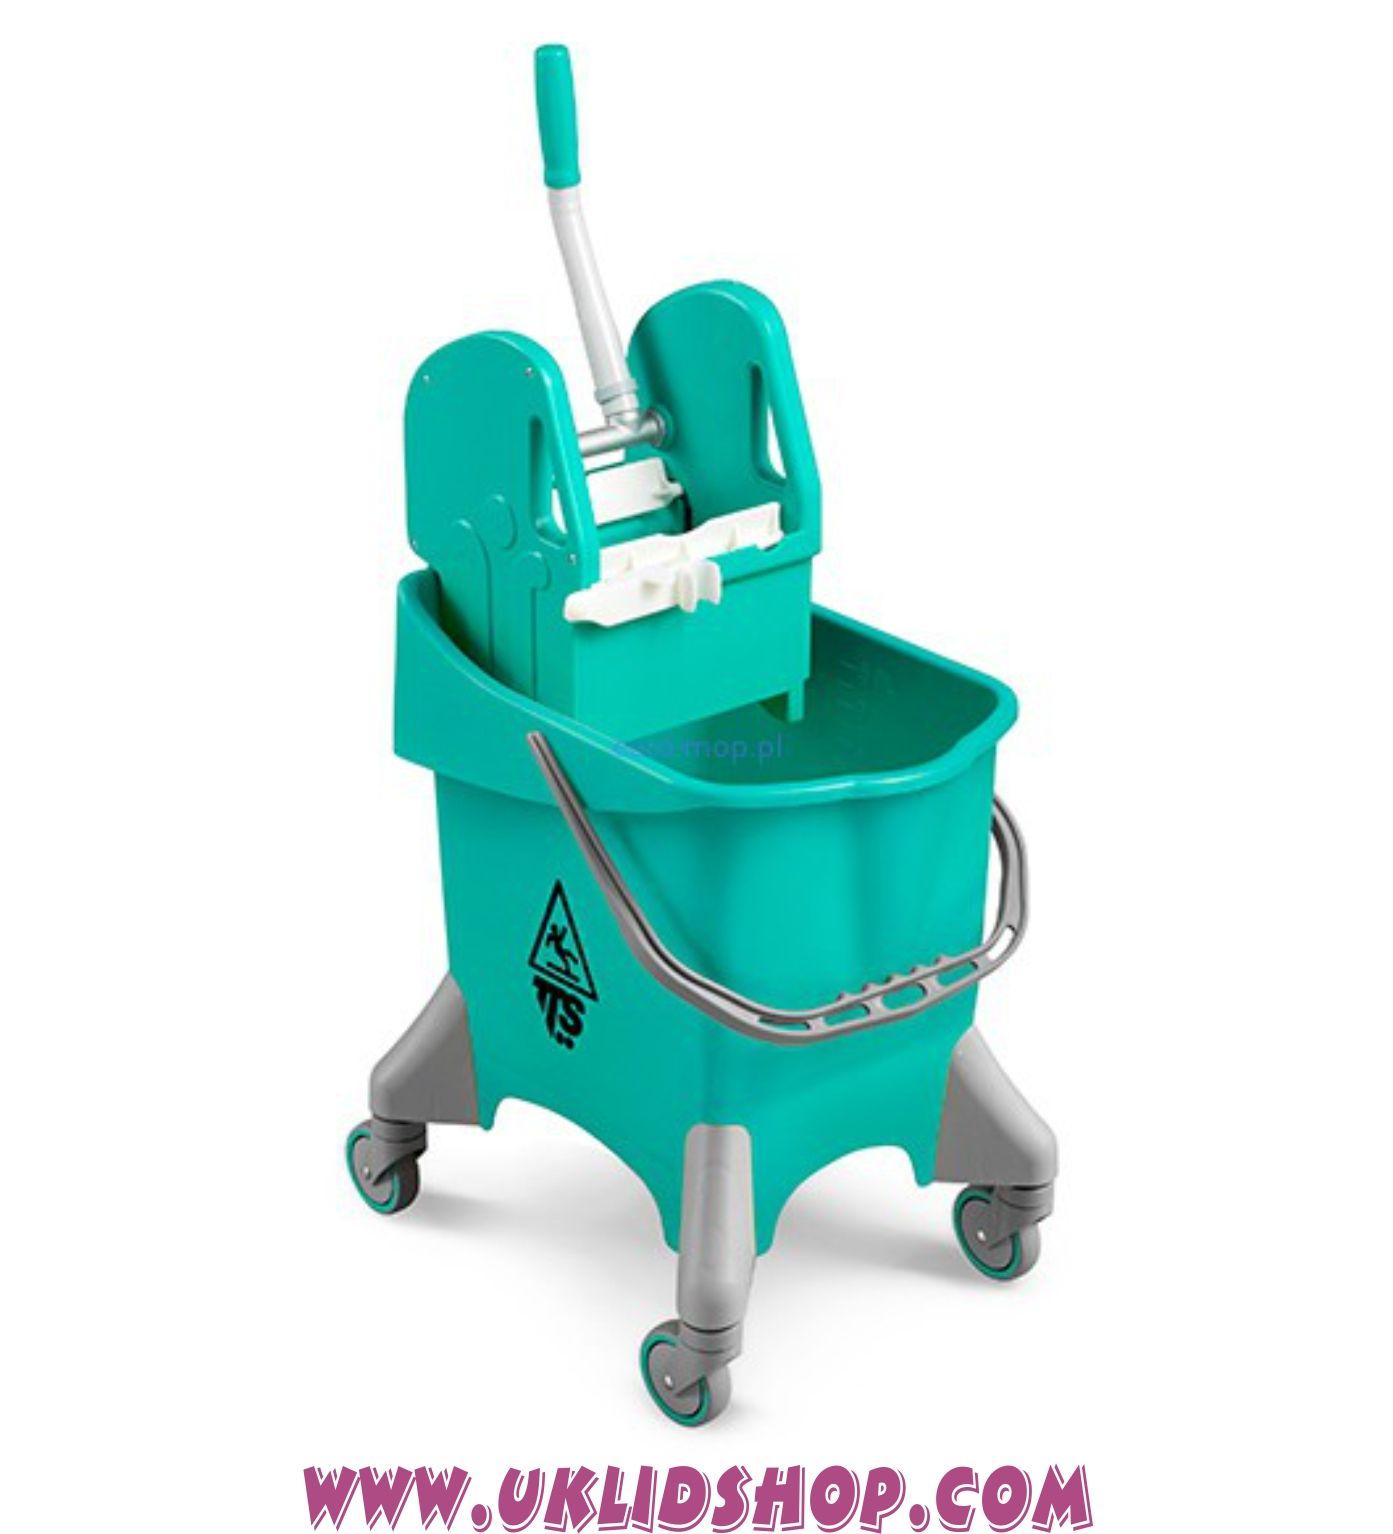 Úklidový vozík Single Junior Centrum Service